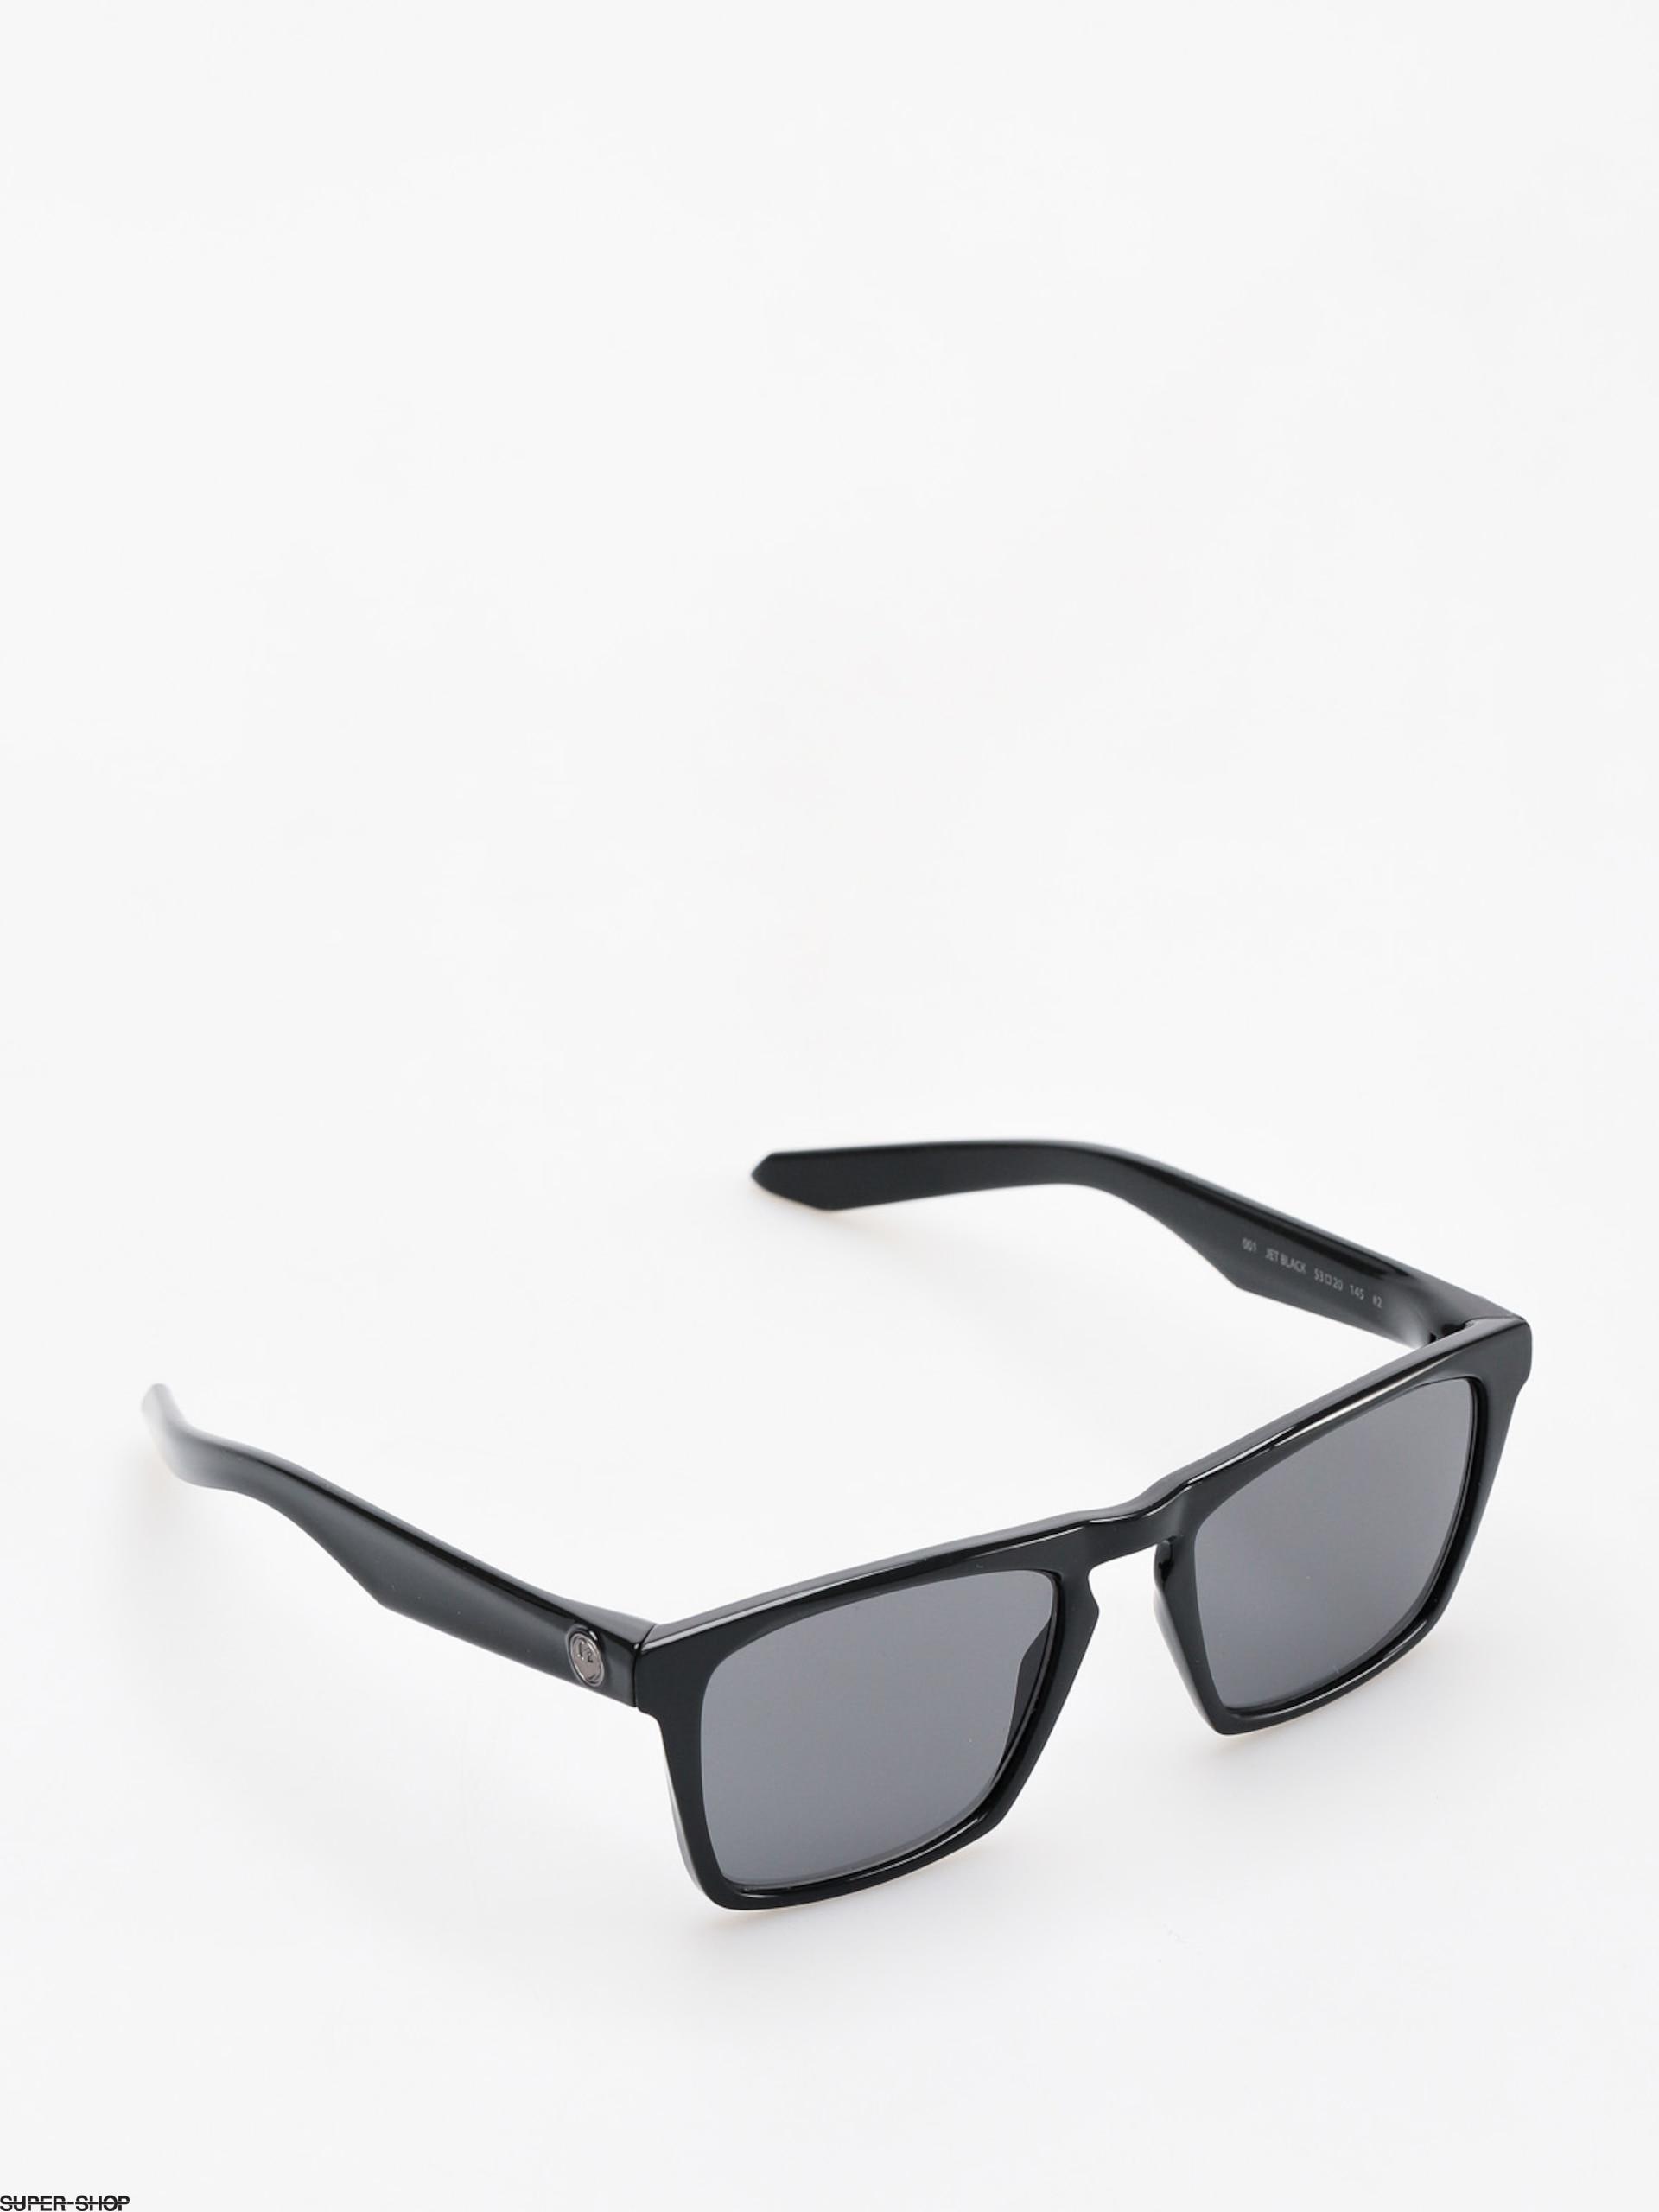 1b53824ccd 960178-w1920-dragon-sunglasses-drac-black-smoke.jpg